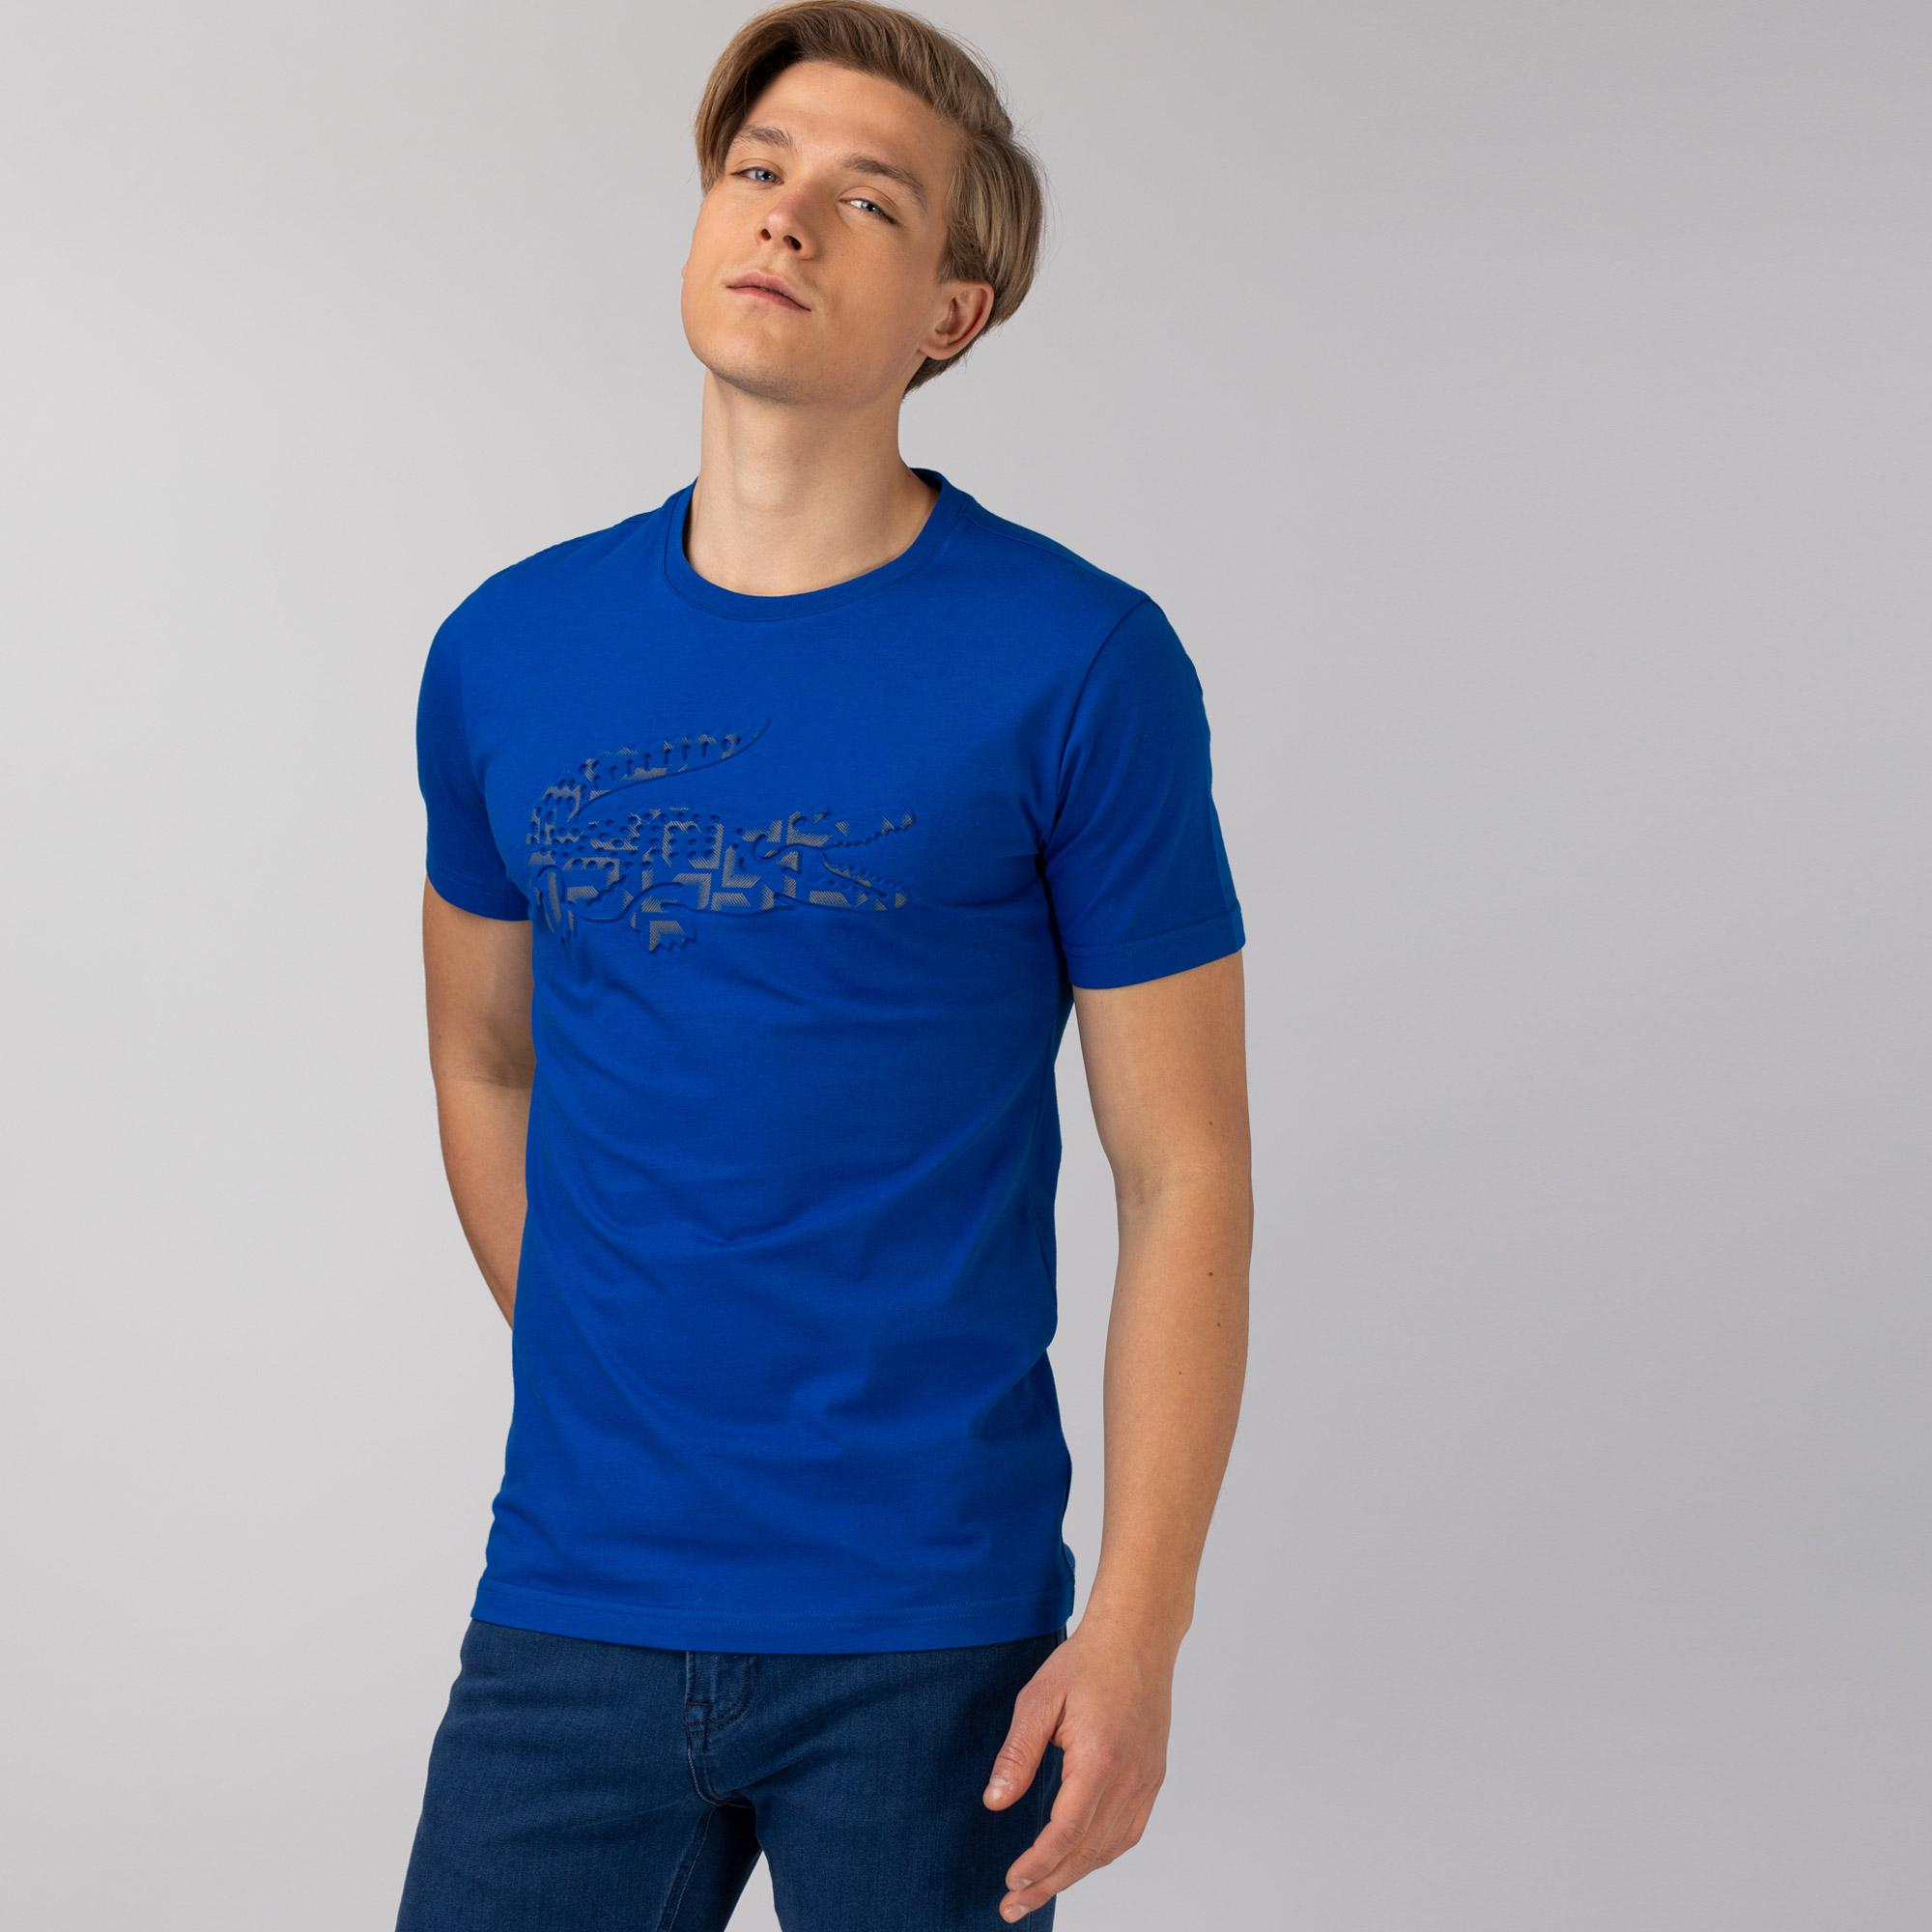 Lacoste Erkek Slim Fit Bisiklet Yaka Baskılı Mavi T-Shirt